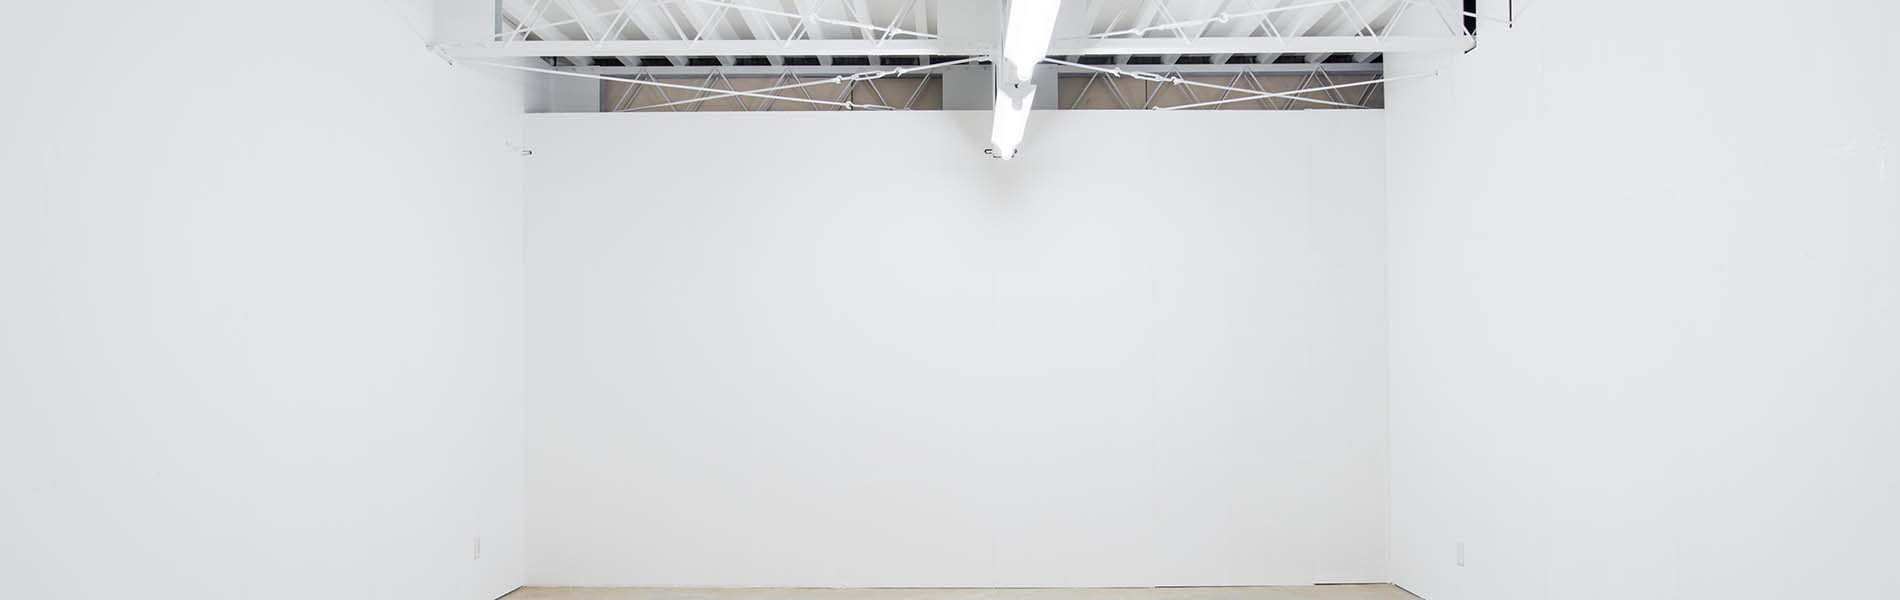 gallery0369の内観、白い壁